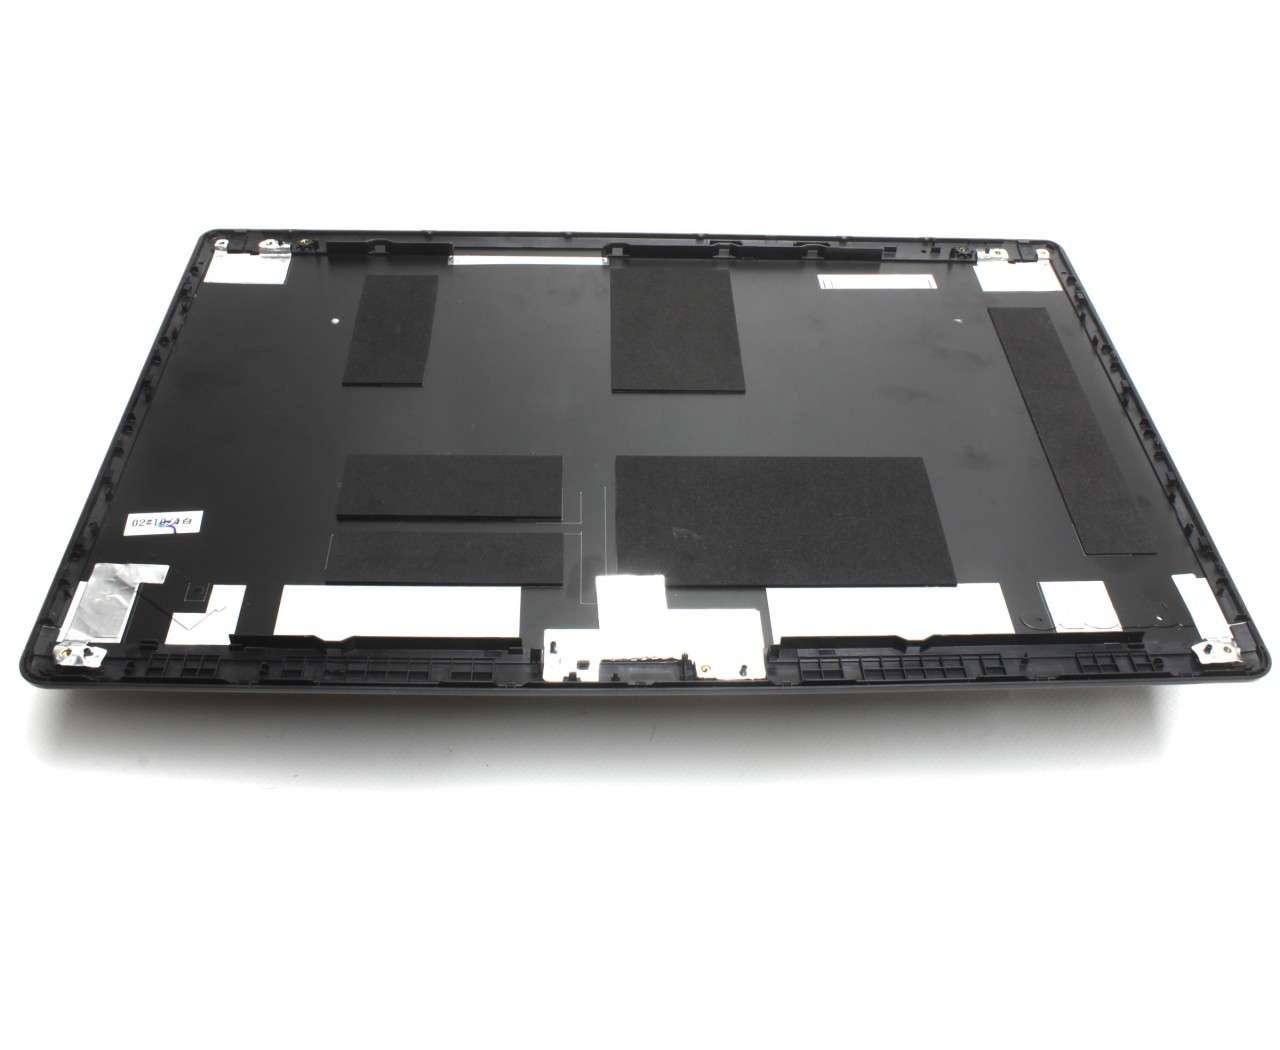 Capac Display BackCover Lenovo ThinkPad Edge E530 Carcasa Display Neagra imagine powerlaptop.ro 2021